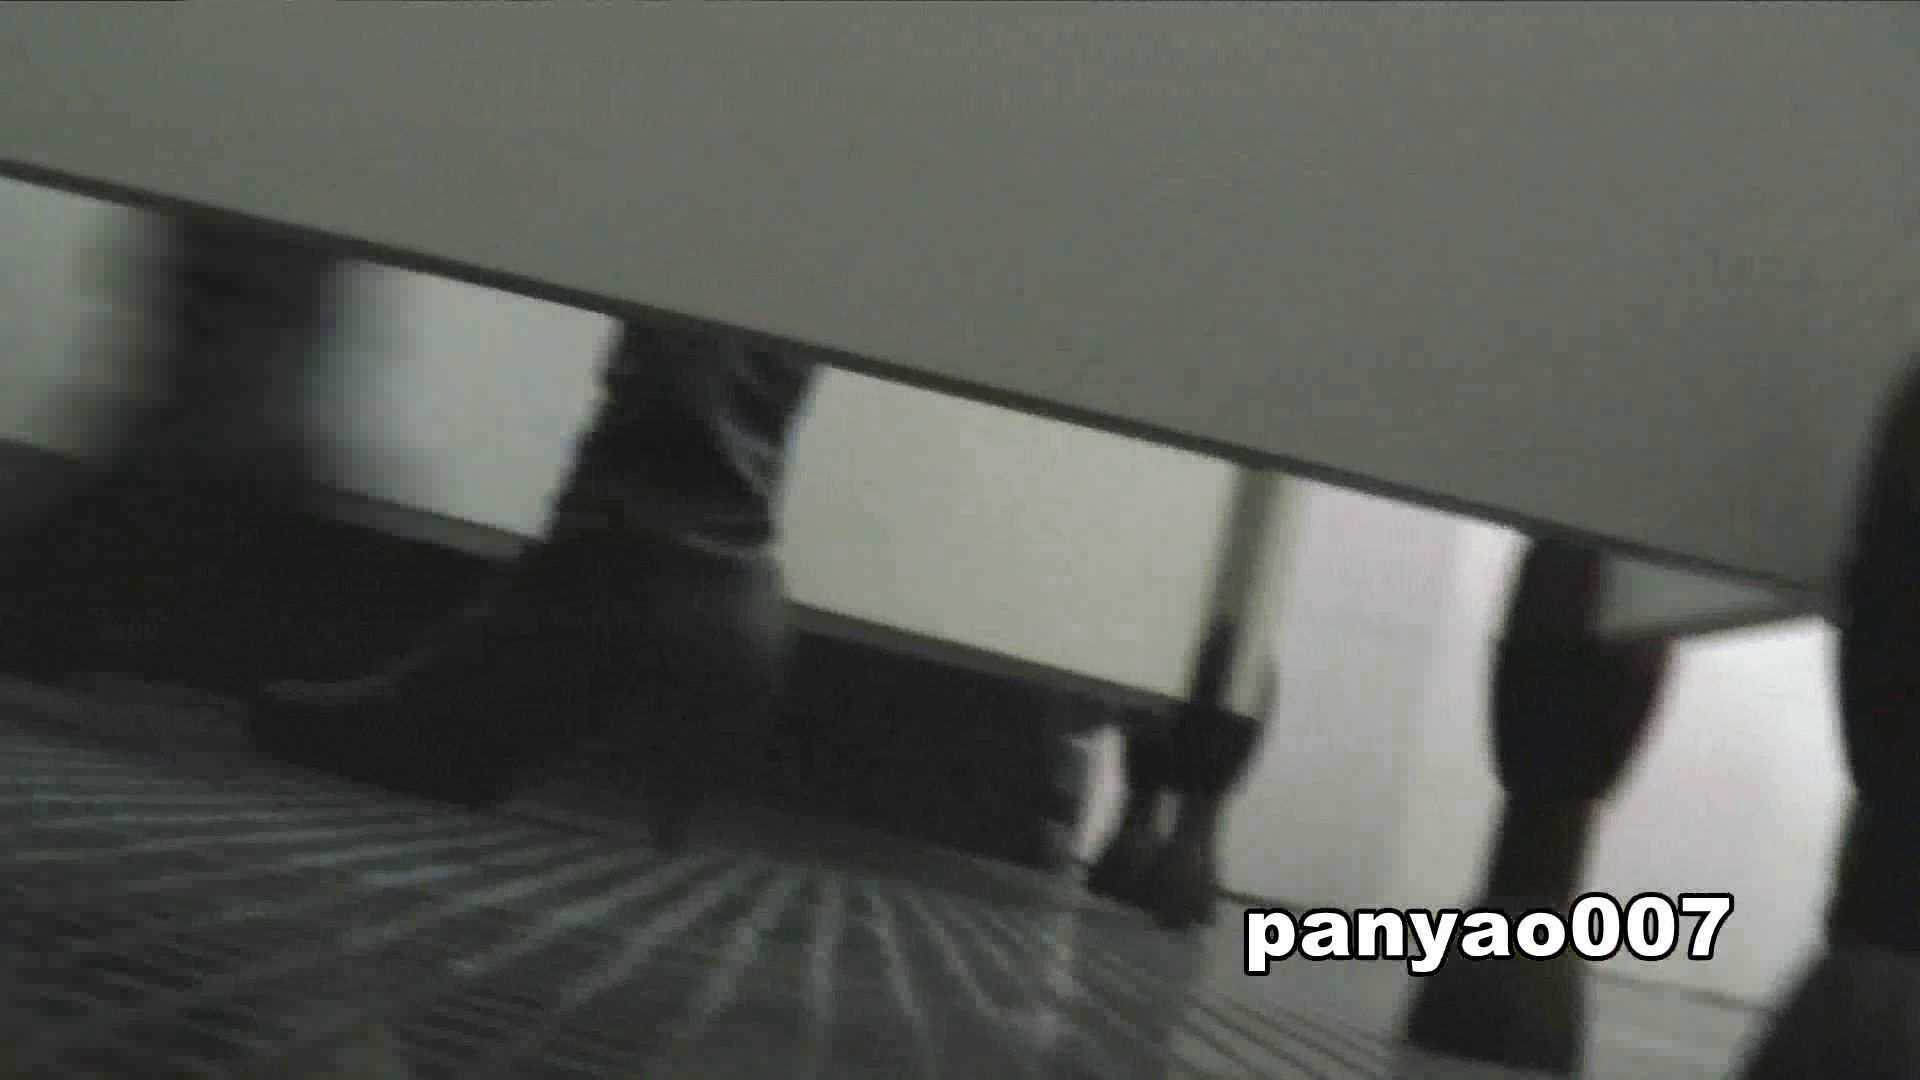 日本成人用品展览会。vol.07 照射実験 着替え 盗撮おめこ無修正動画無料 102連発 95